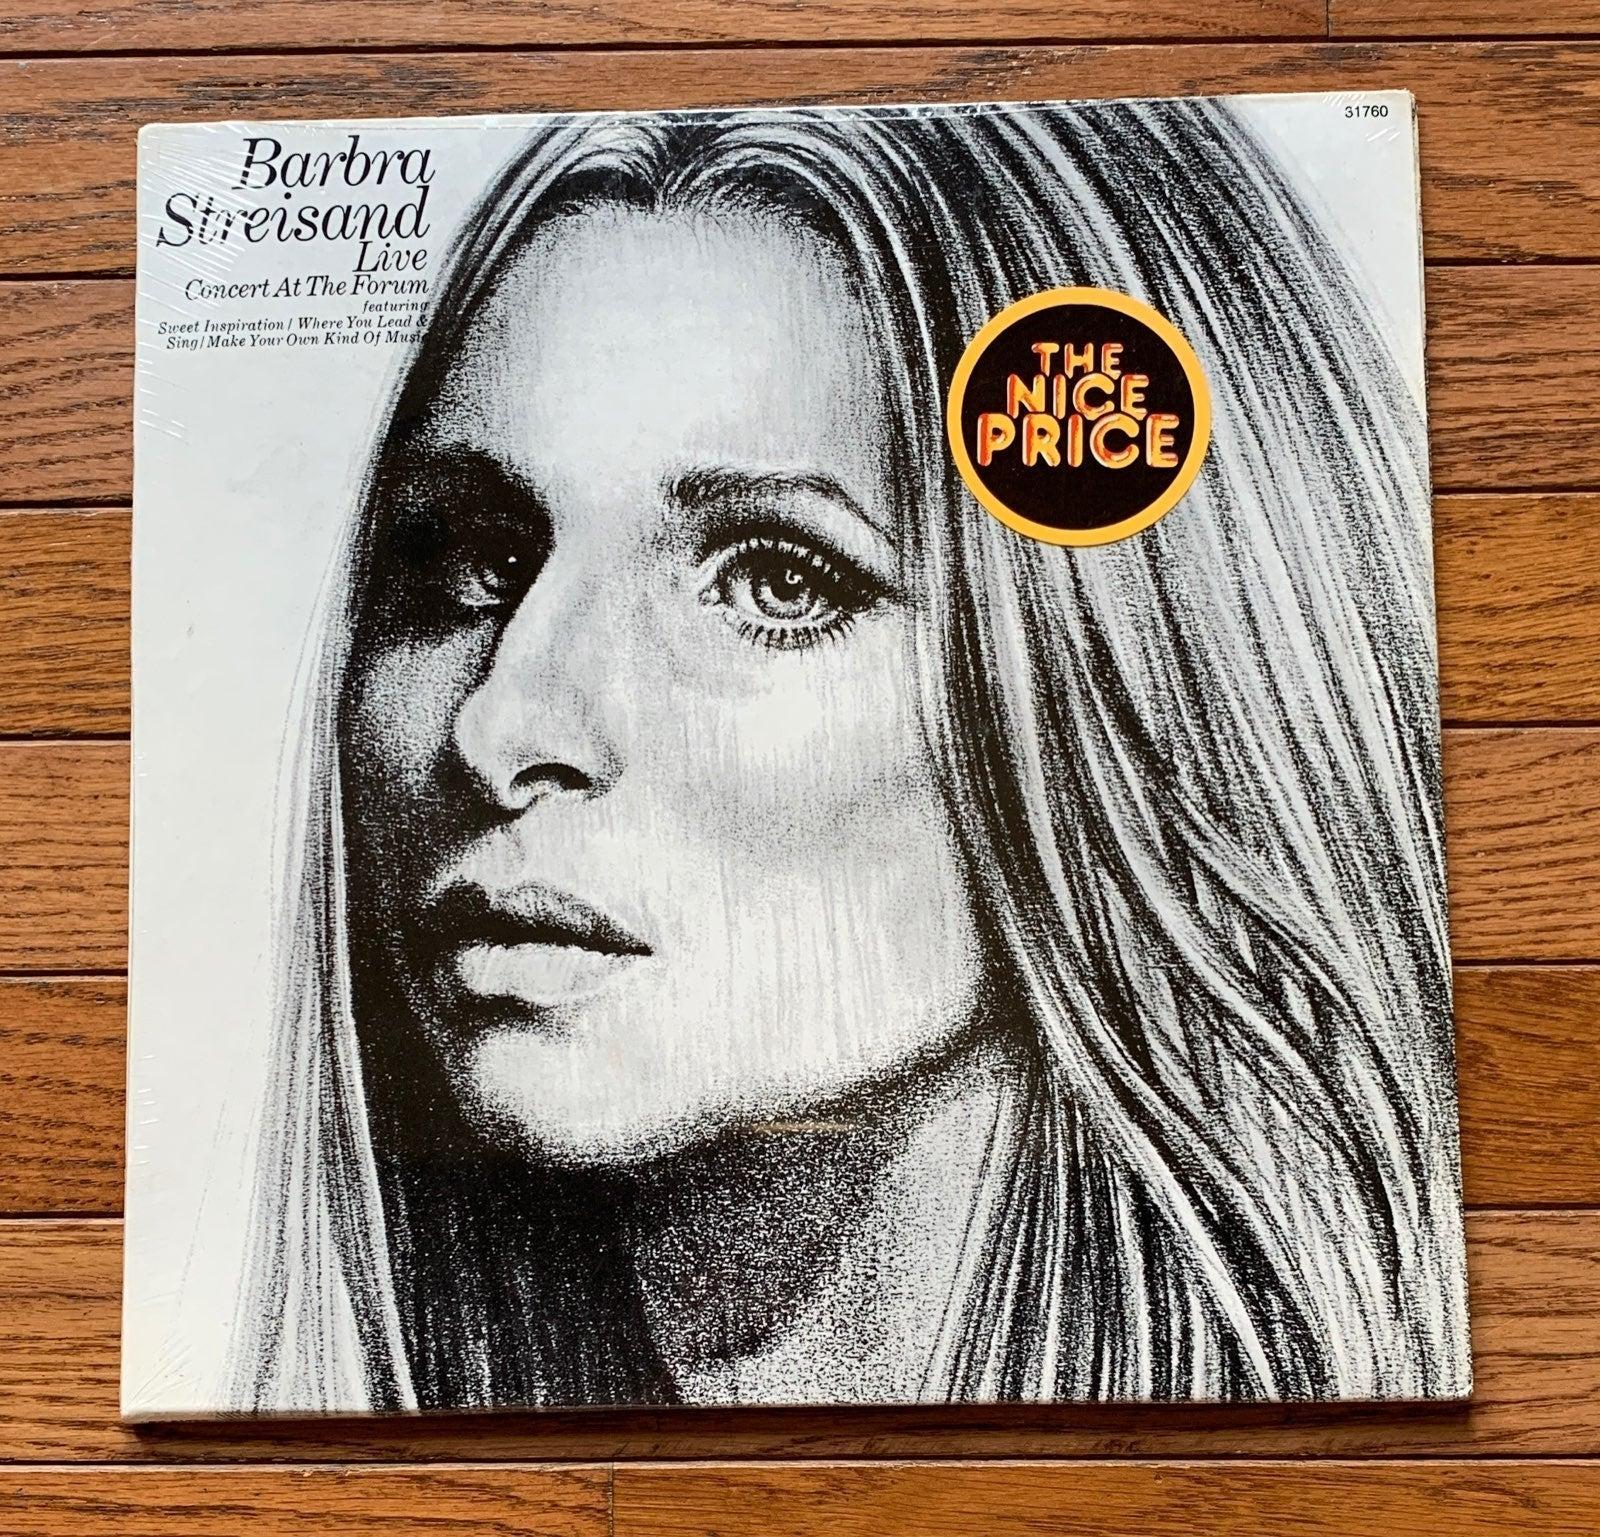 Sealed Barbra Streisand Vinyl Record LP